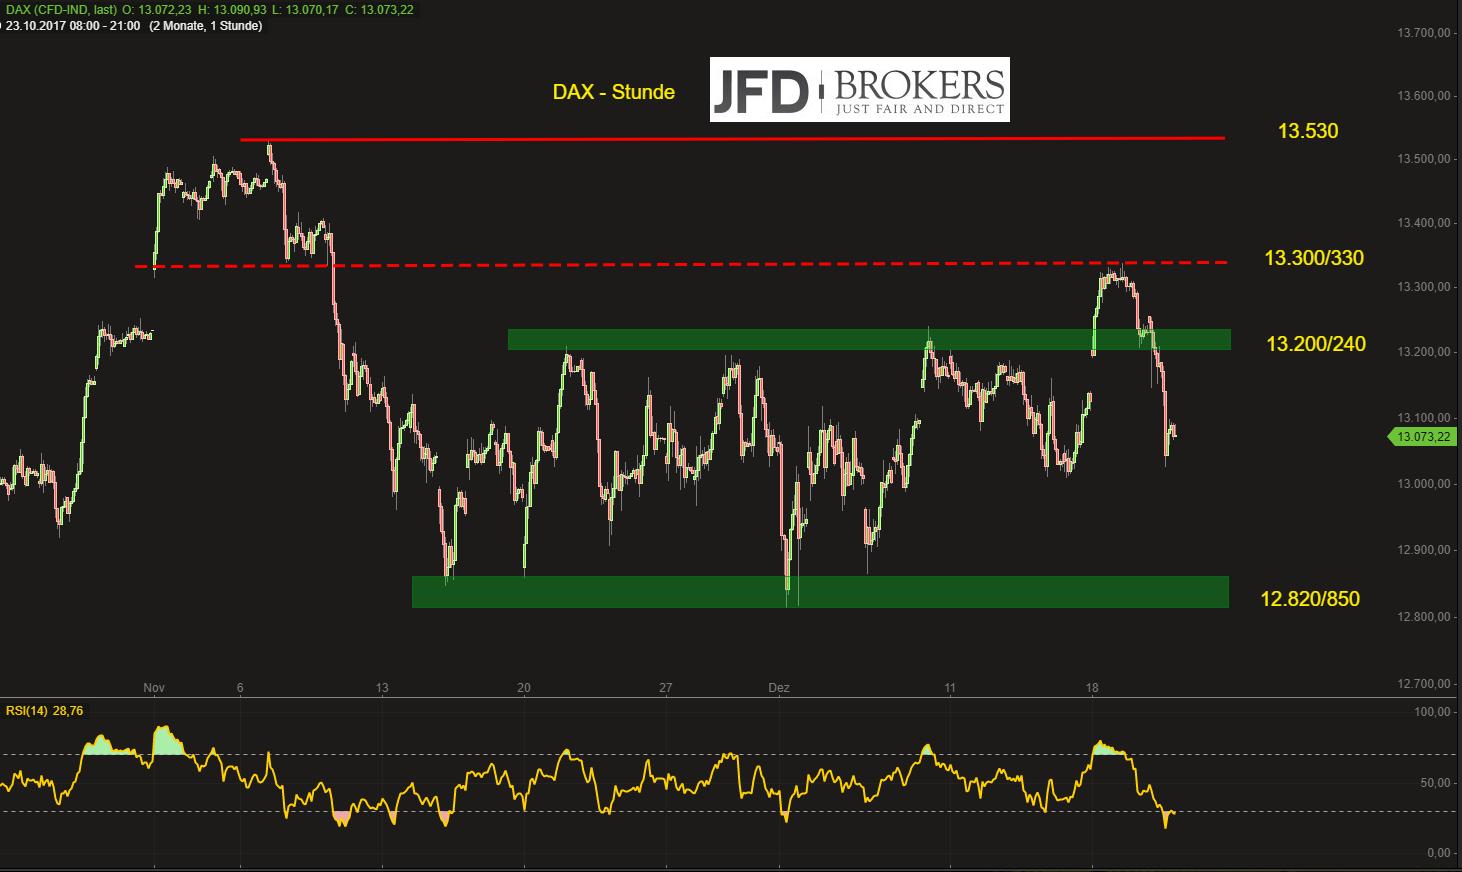 Weihnachtsrallye-abgesagt-DAX-zurück-unter-13-200-JFD-Brokers-GodmodeTrader.de-2